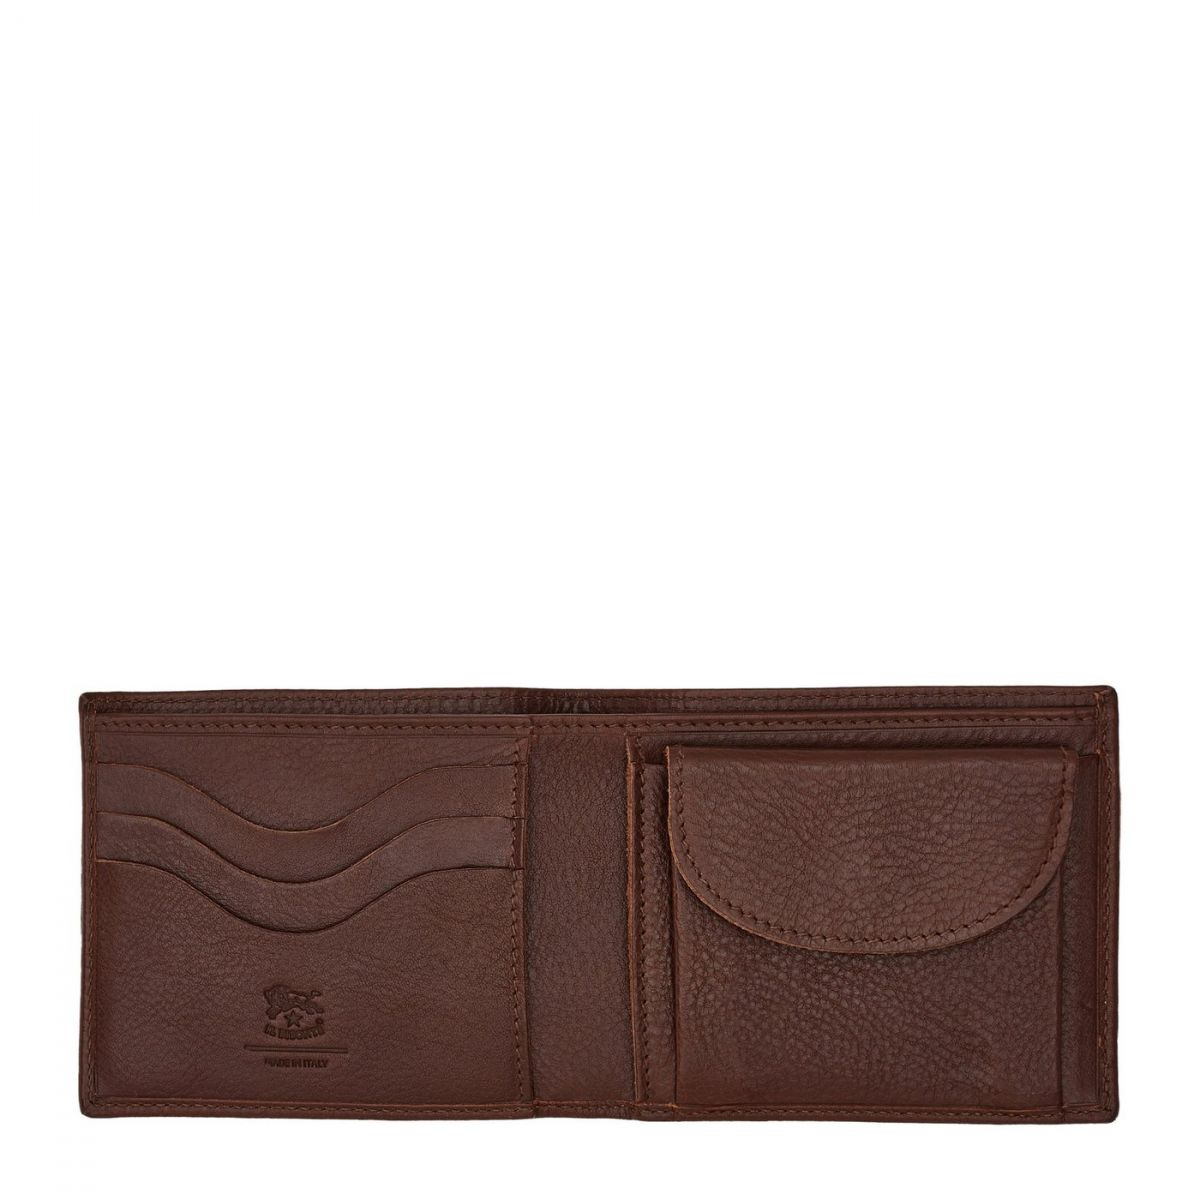 Men's Bi-Fold Wallet  in Cowhide Leather SBW041 color Brown | Details